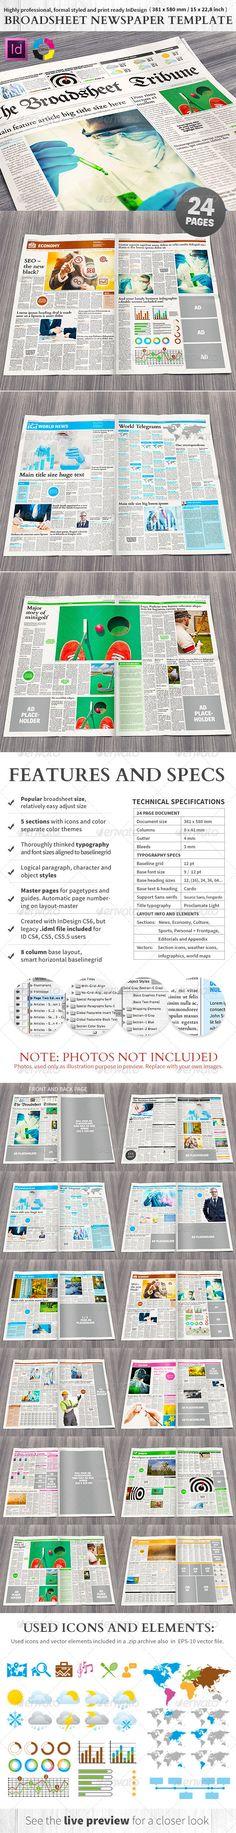 Indesign Modern Newspaper Magazine Template A3 Newspaper - forbearance agreement template